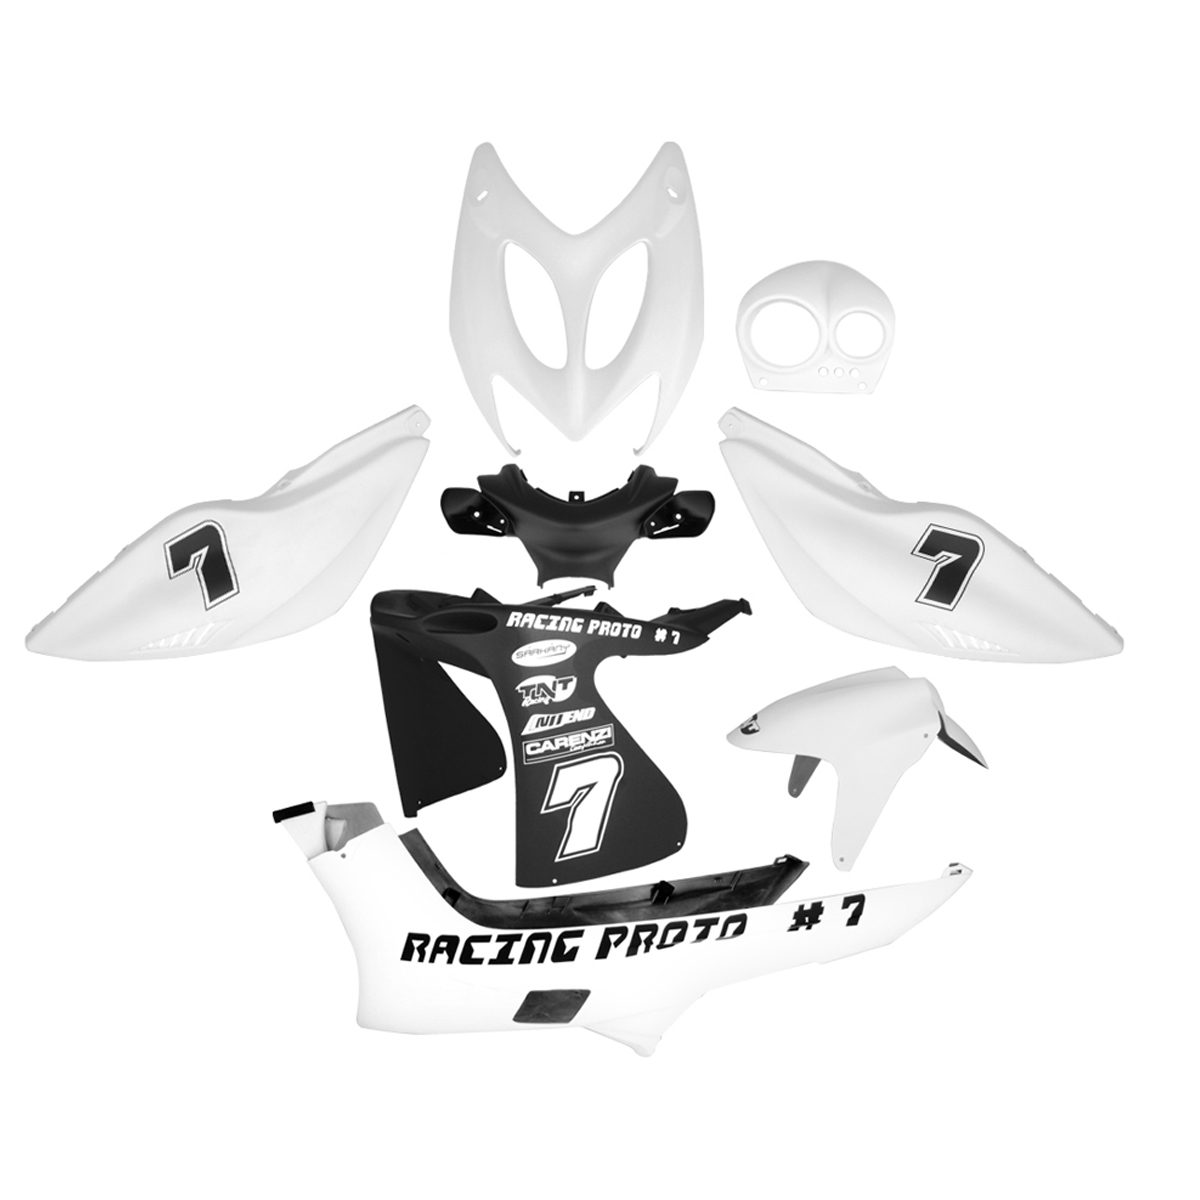 Kit habillage complet Racing Nitro - Blanc mat